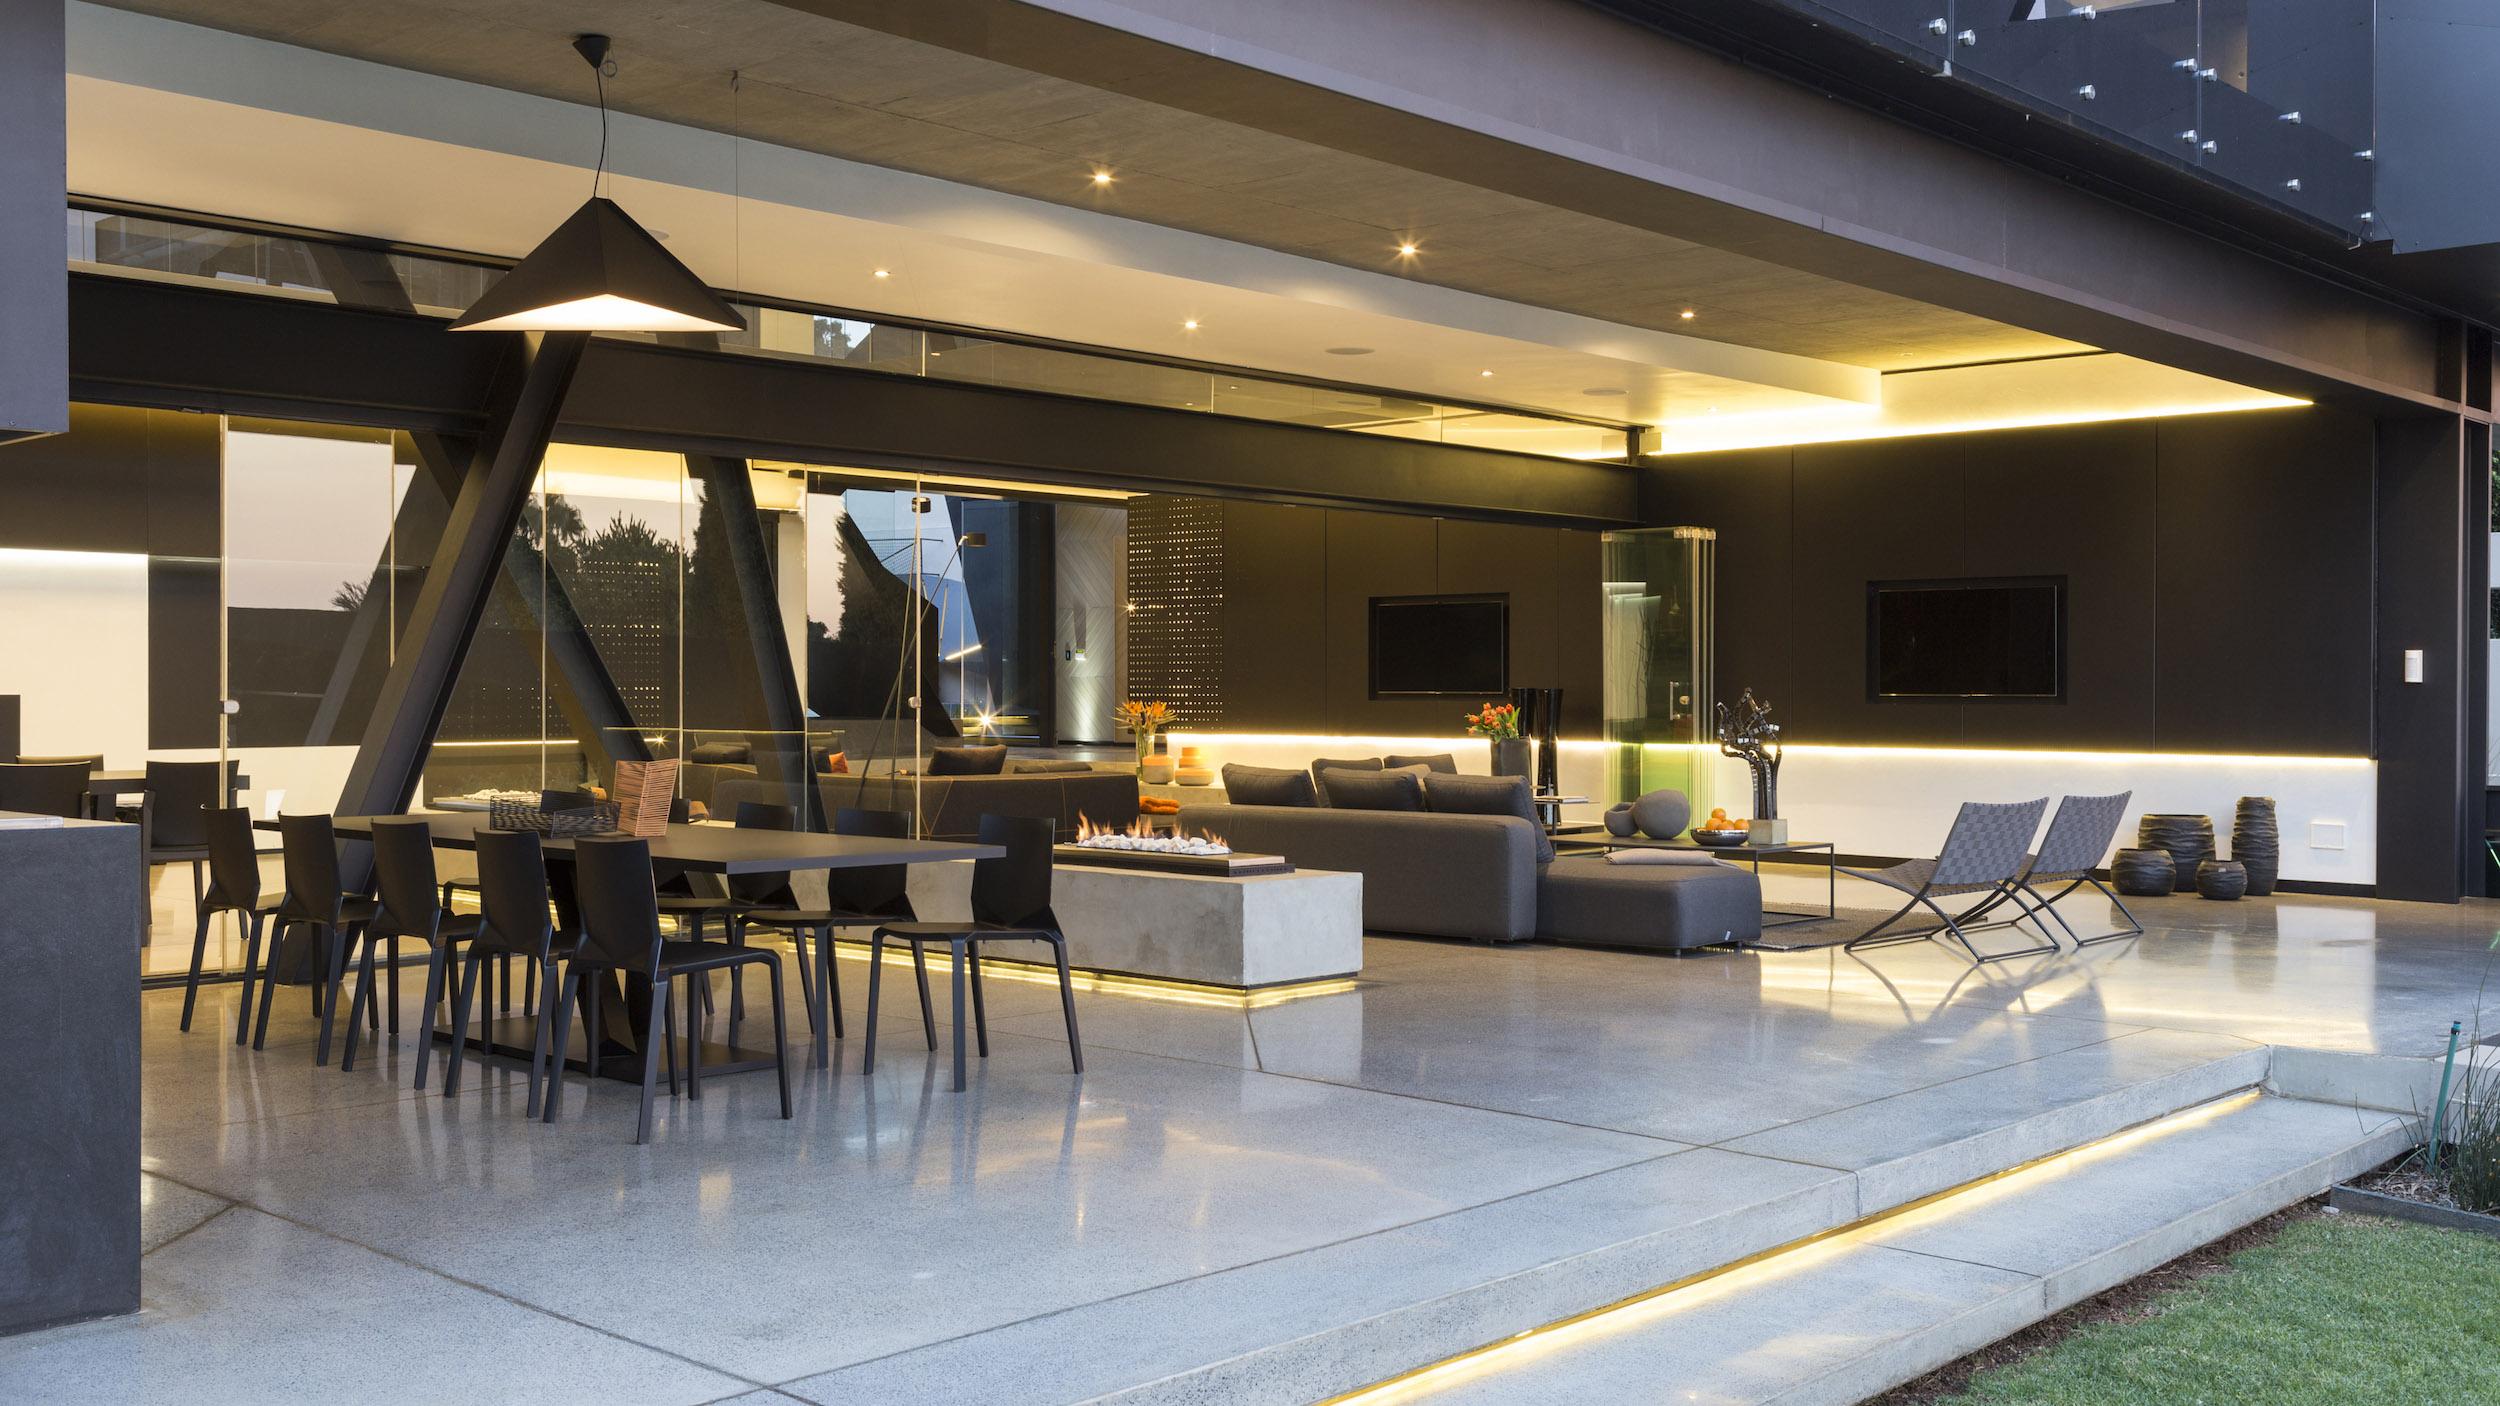 Kloof Road Masterpiece House in Johannesburg by Nico van der Meulen Architects-23